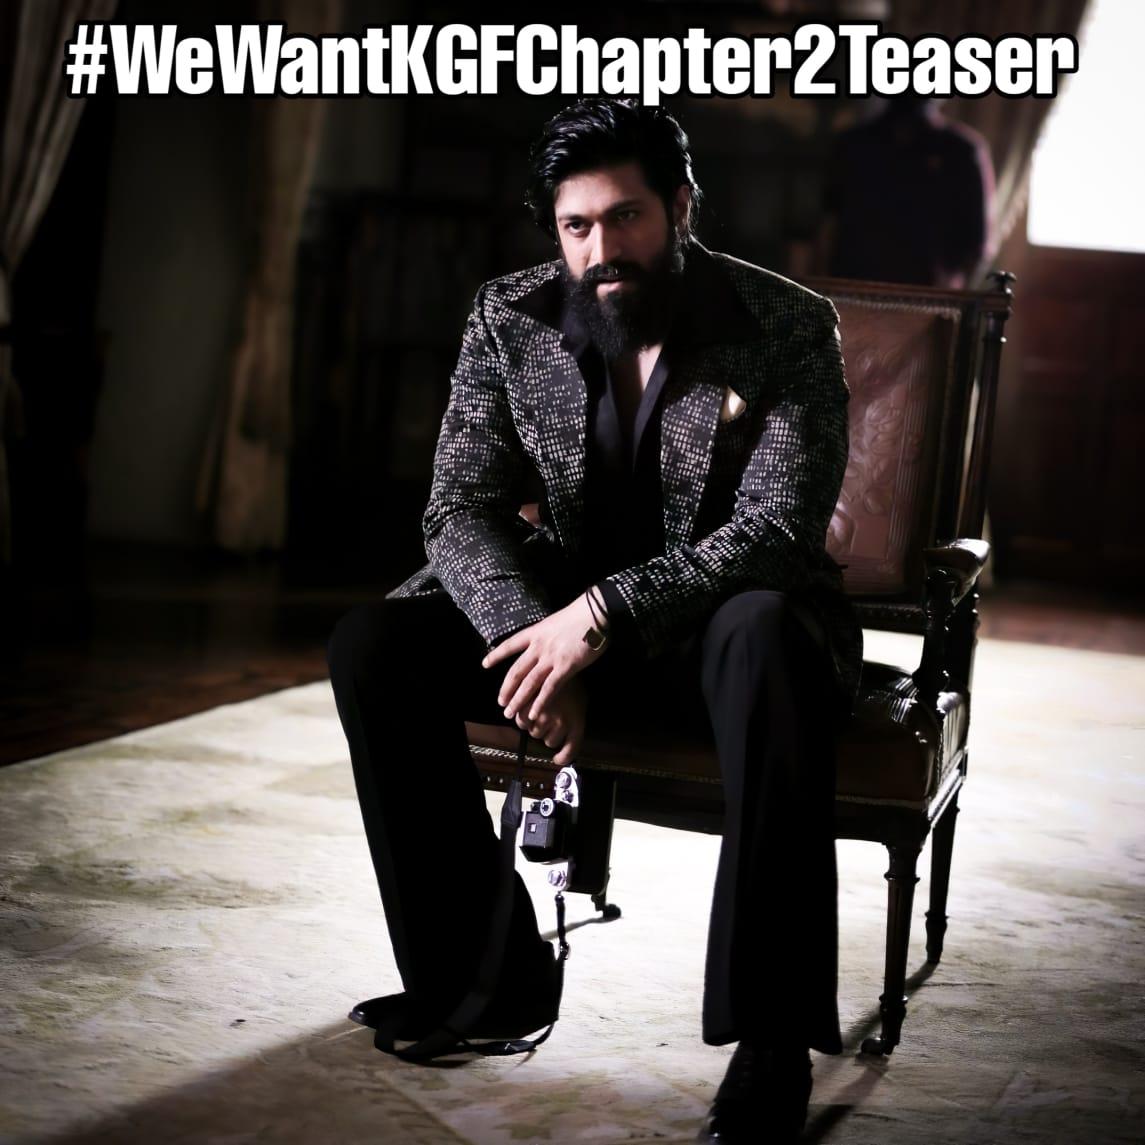 Team @hombalefilms Please Release #KGFChapter2 Teaser   No updates From Past 10 Months   Release Date also Nearing .......  @prashanth_neel Sir 🙏  #WeWantKGFChapter2Teaser l @TheNameIsYash https://t.co/8PbAnXvU18